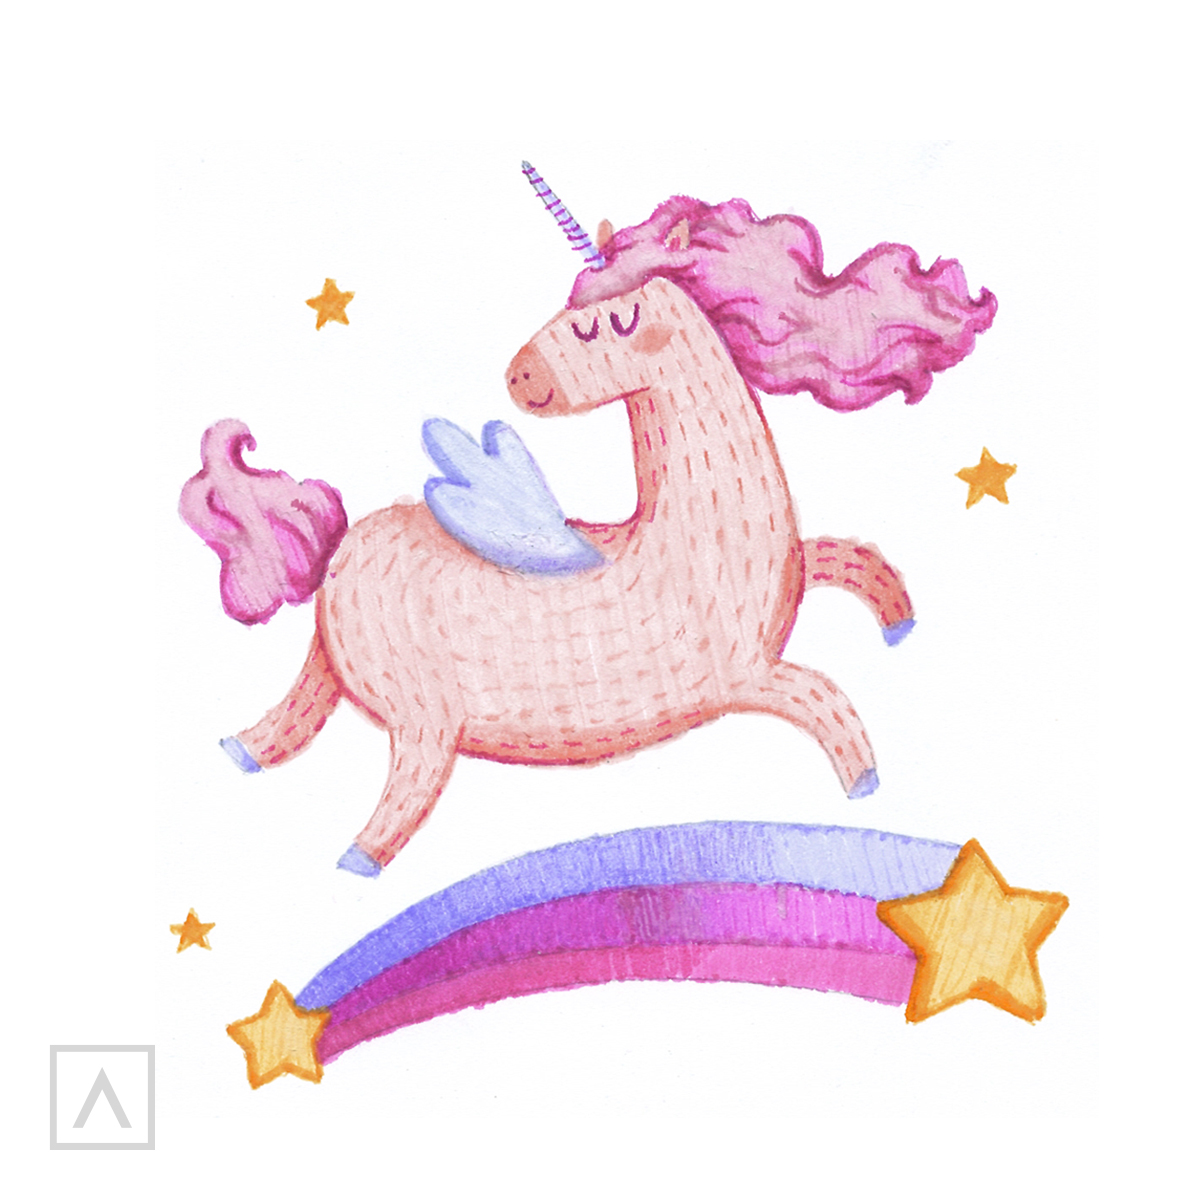 Image of a unicorn